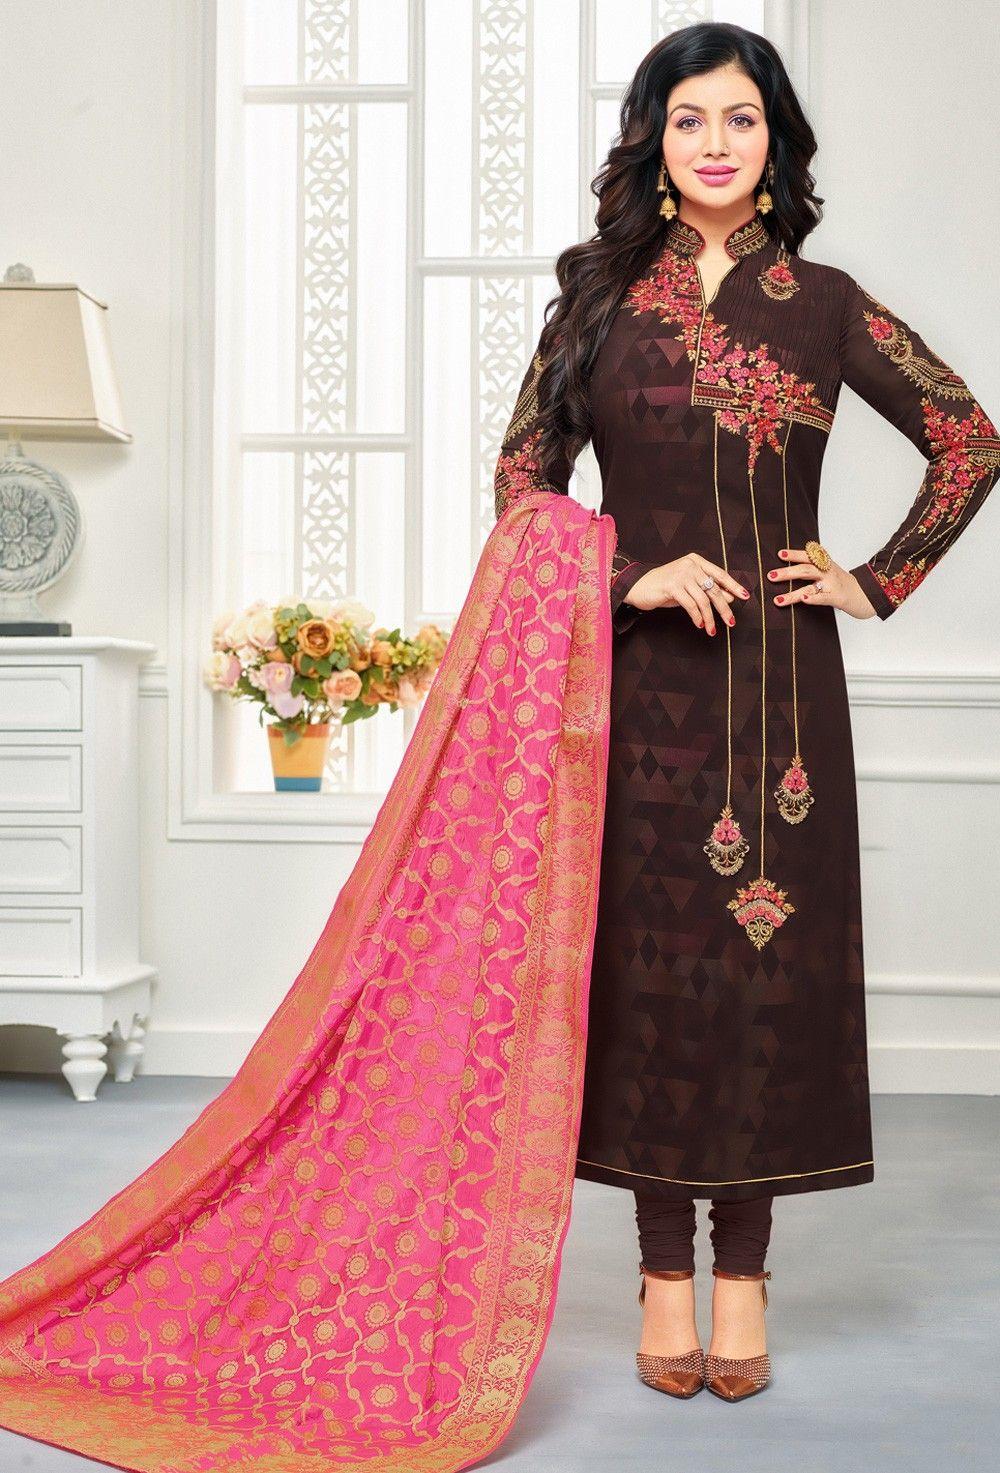 New Trend Of Winter Fall Latest Salwar Kameez Designs 2019